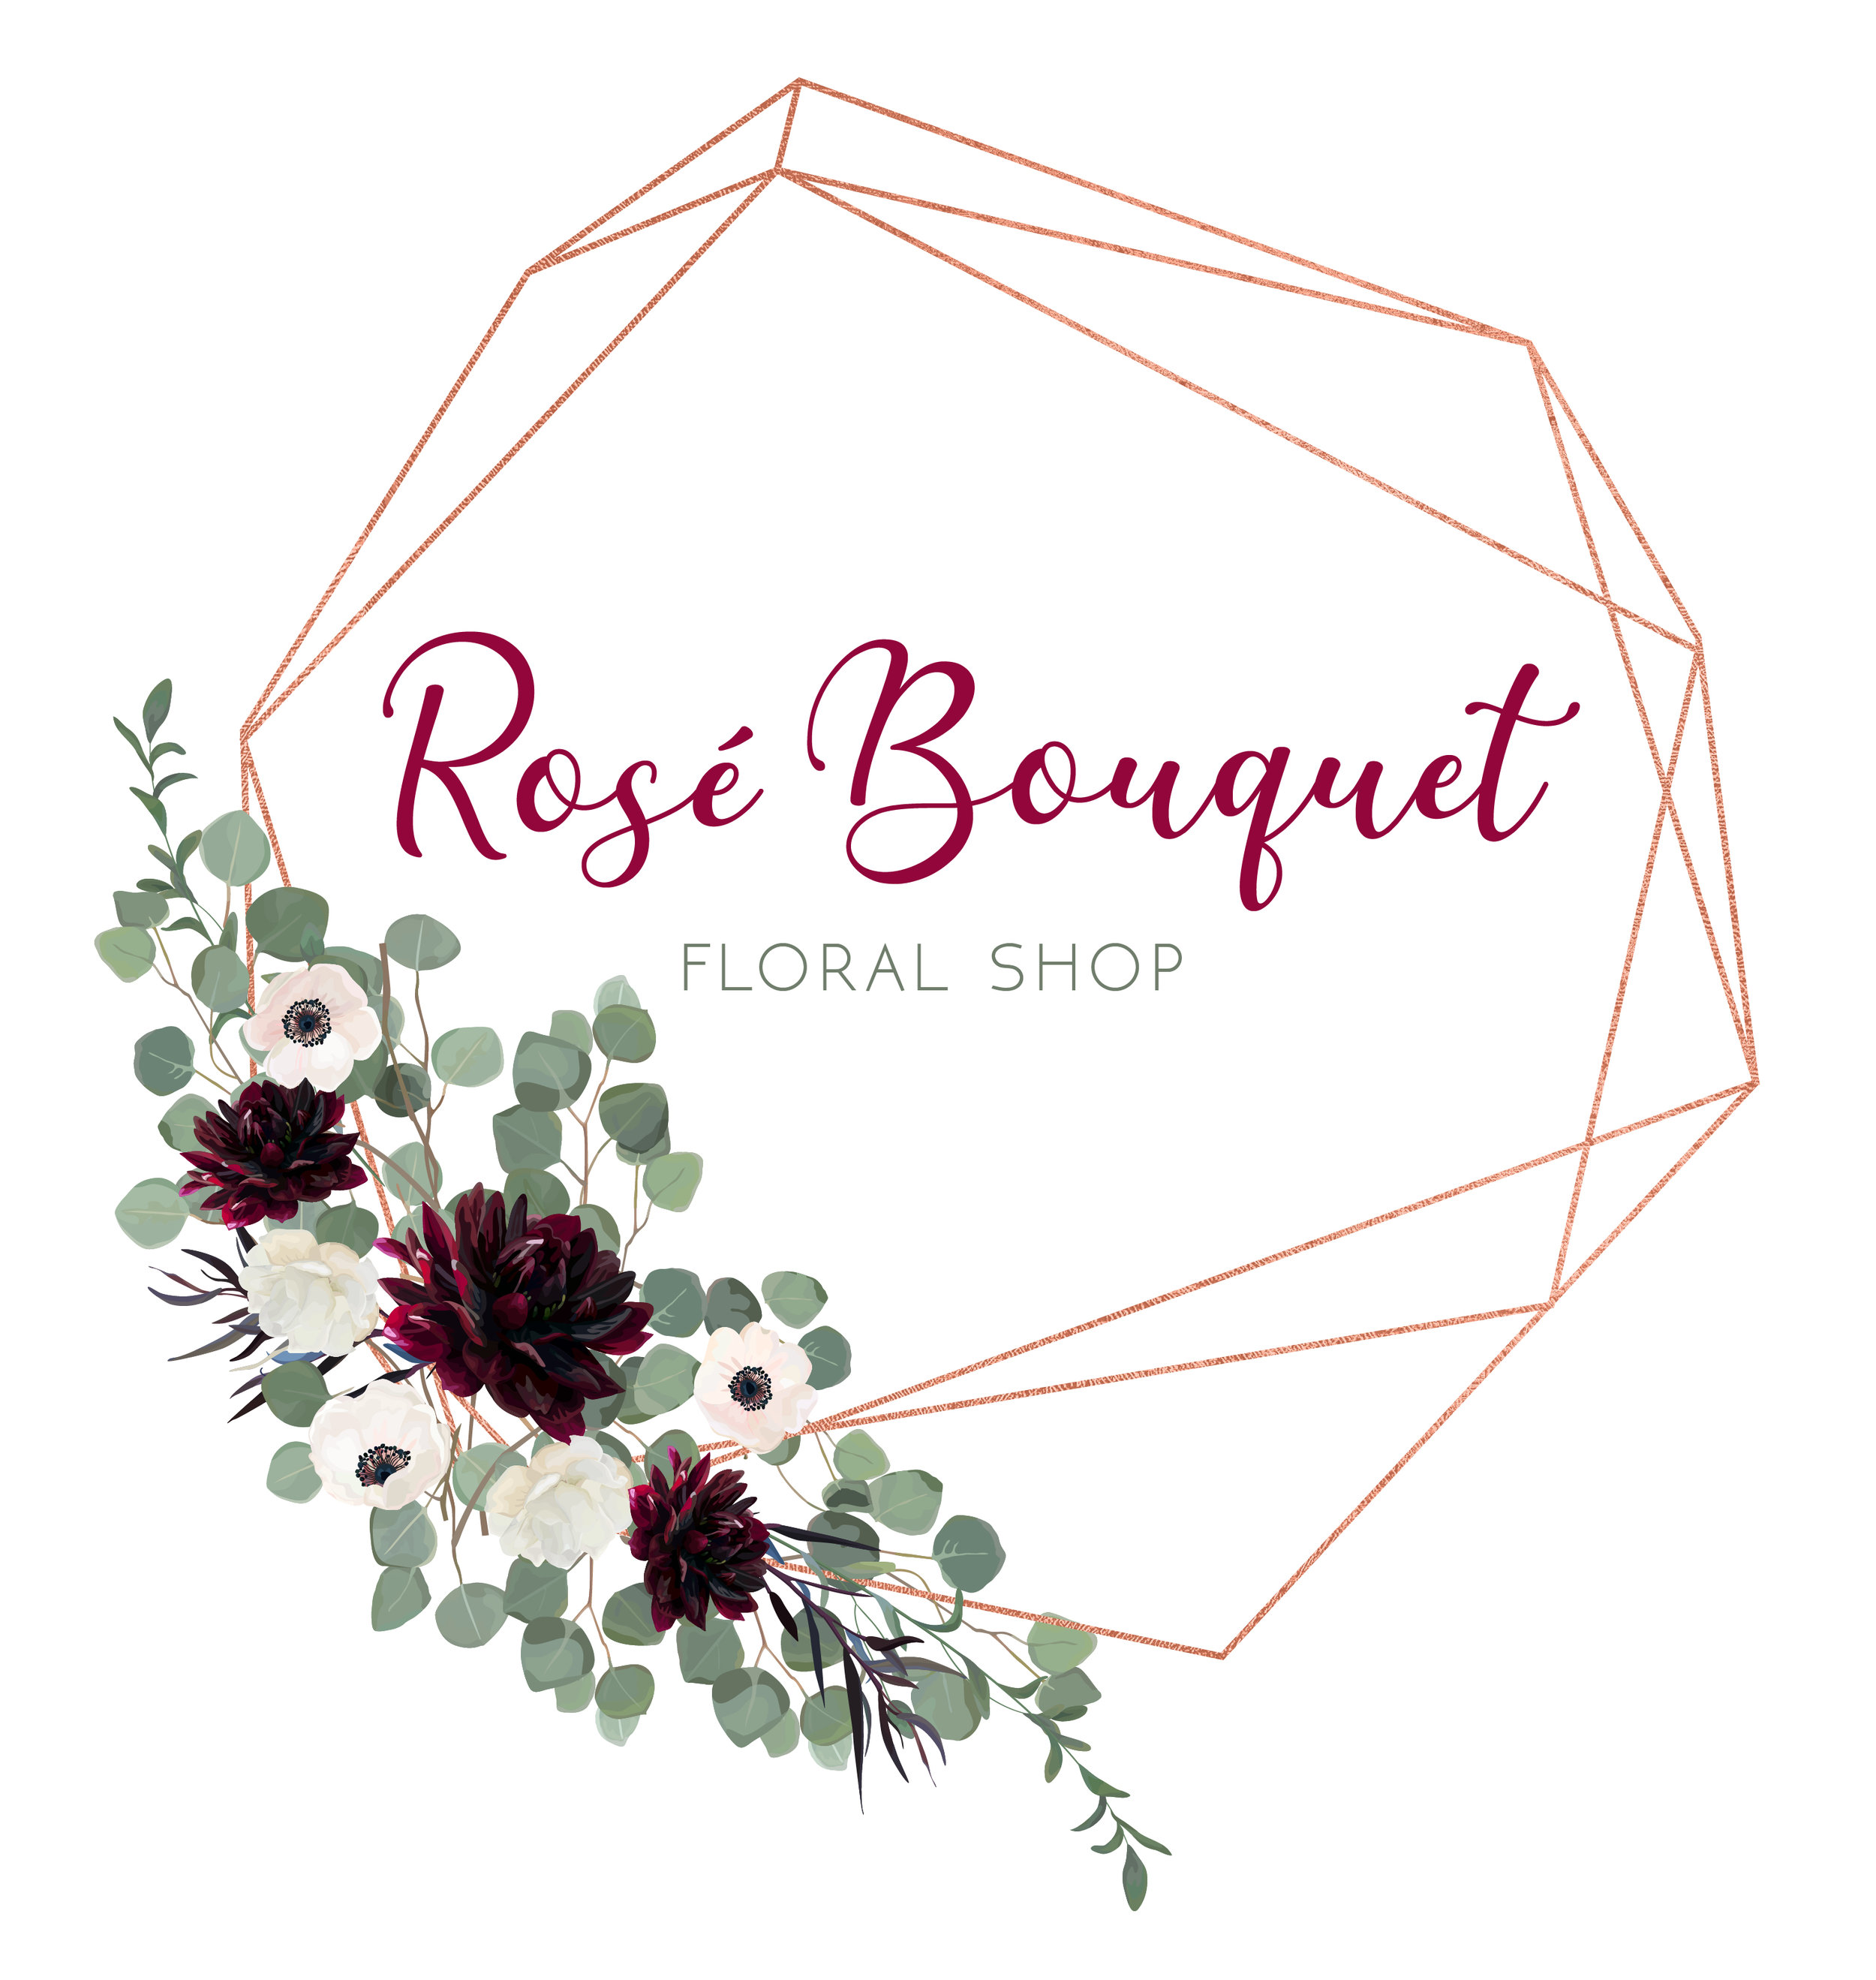 ROSE BOUQUET FLORAL LOGO-01.jpg